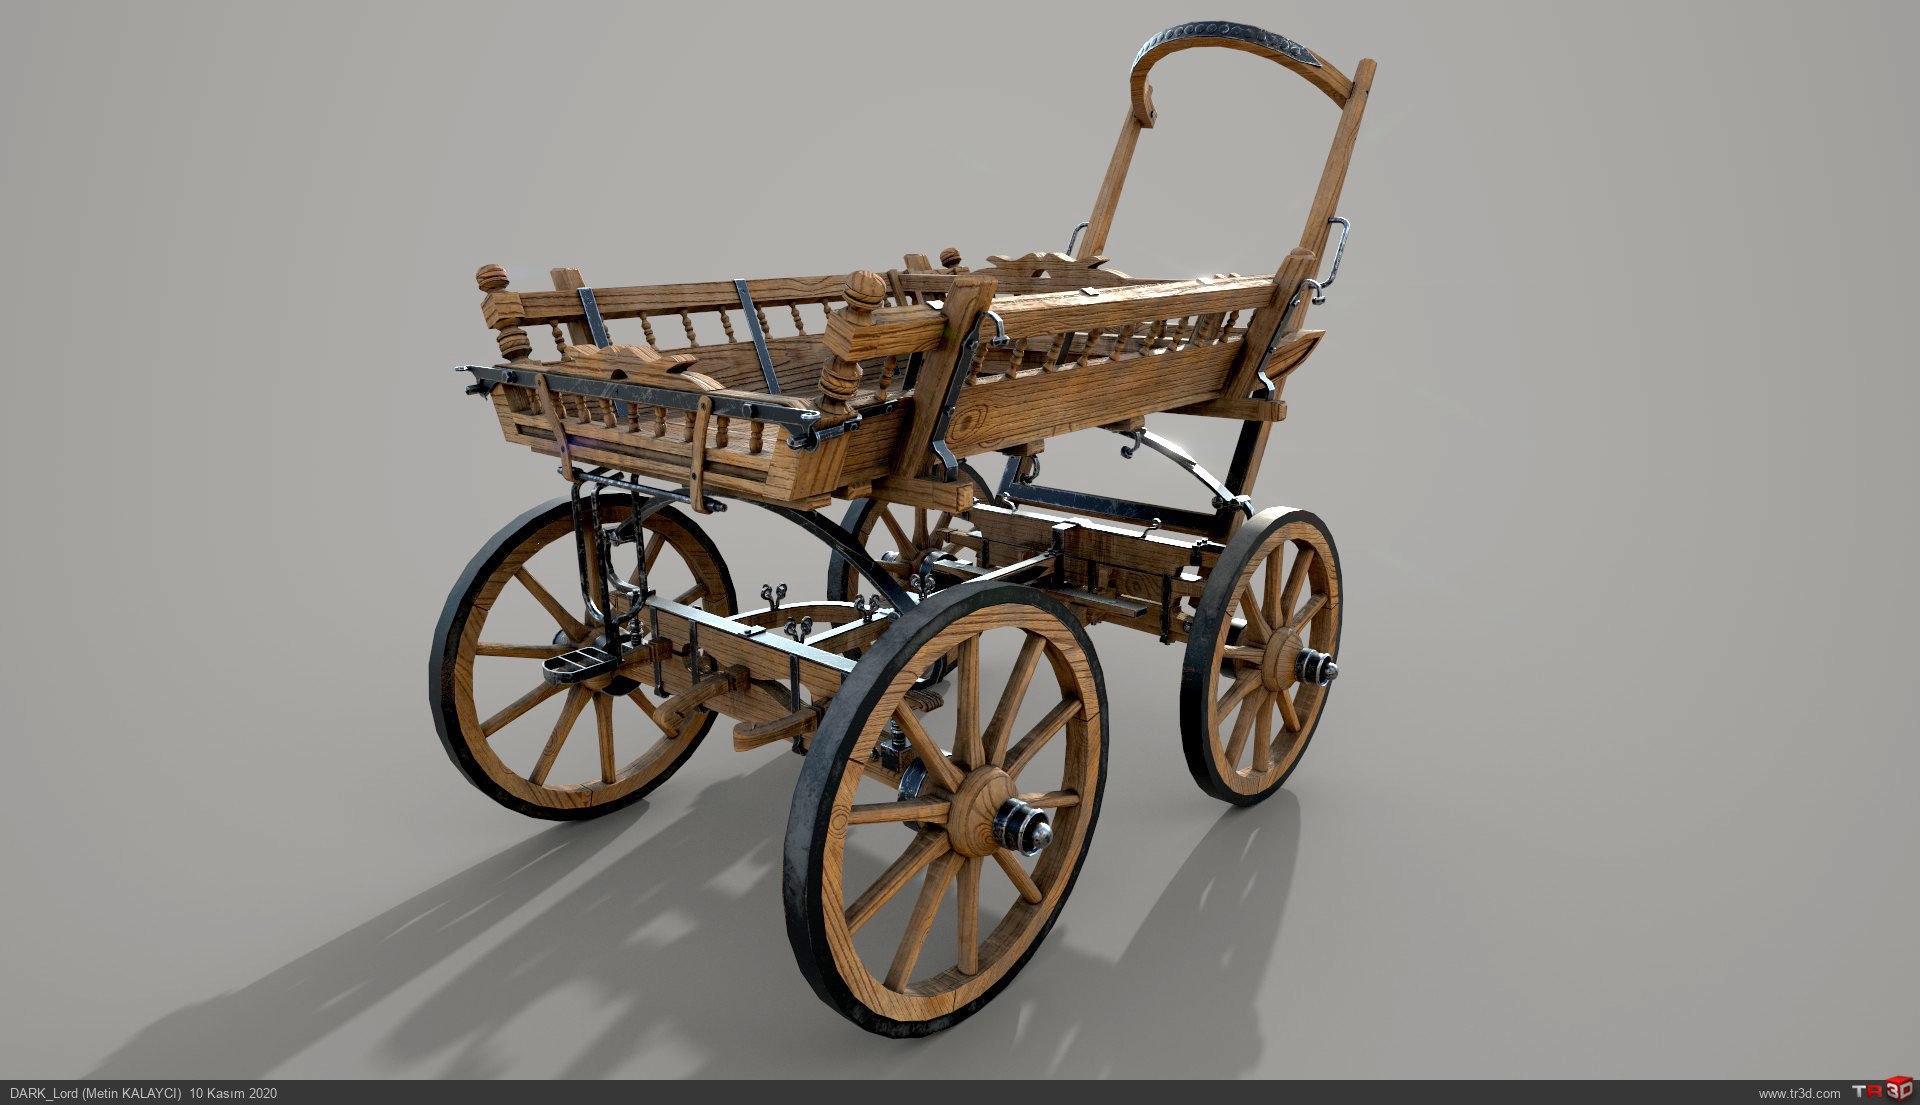 At arabası 3